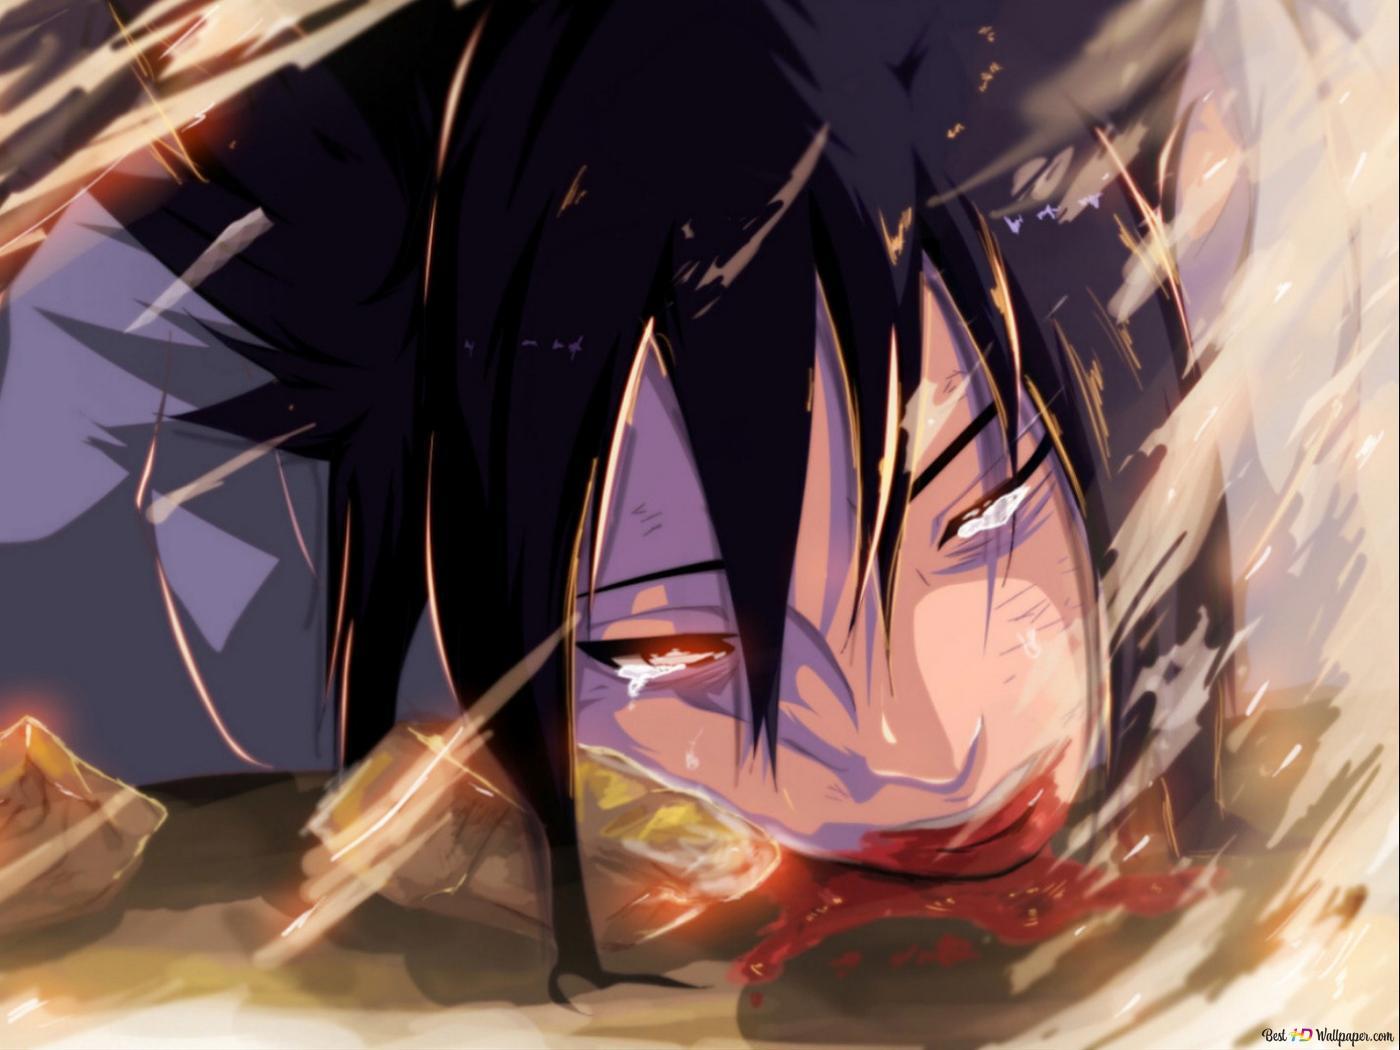 Naruto Shippuden - Sasuke Uchiha, Tot HD Hintergrundbilder herunterladen